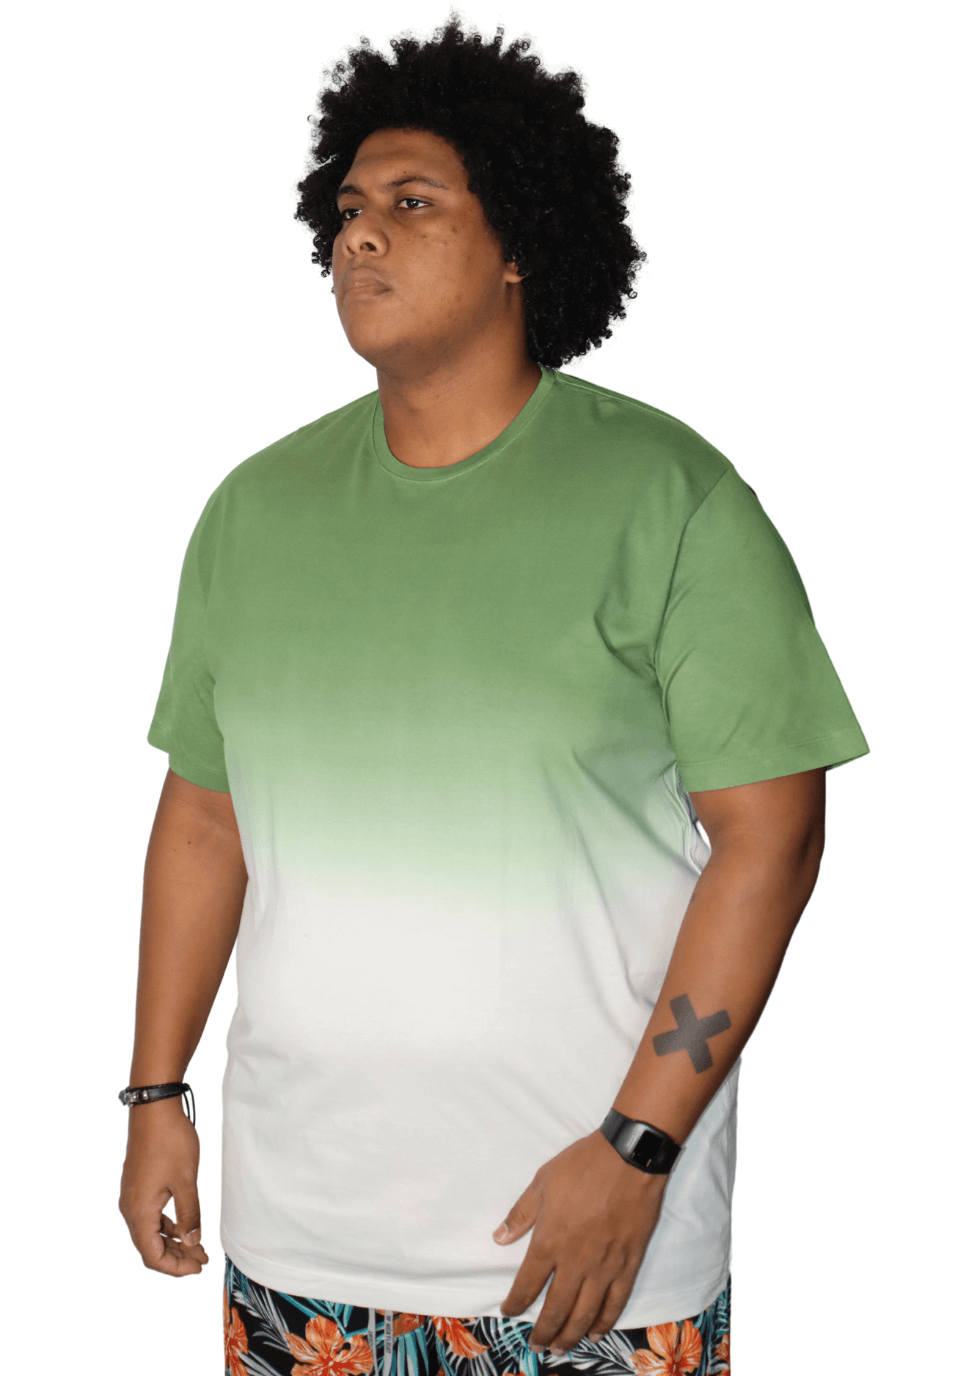 Camiseta Tie Dye Degradê Plus Size